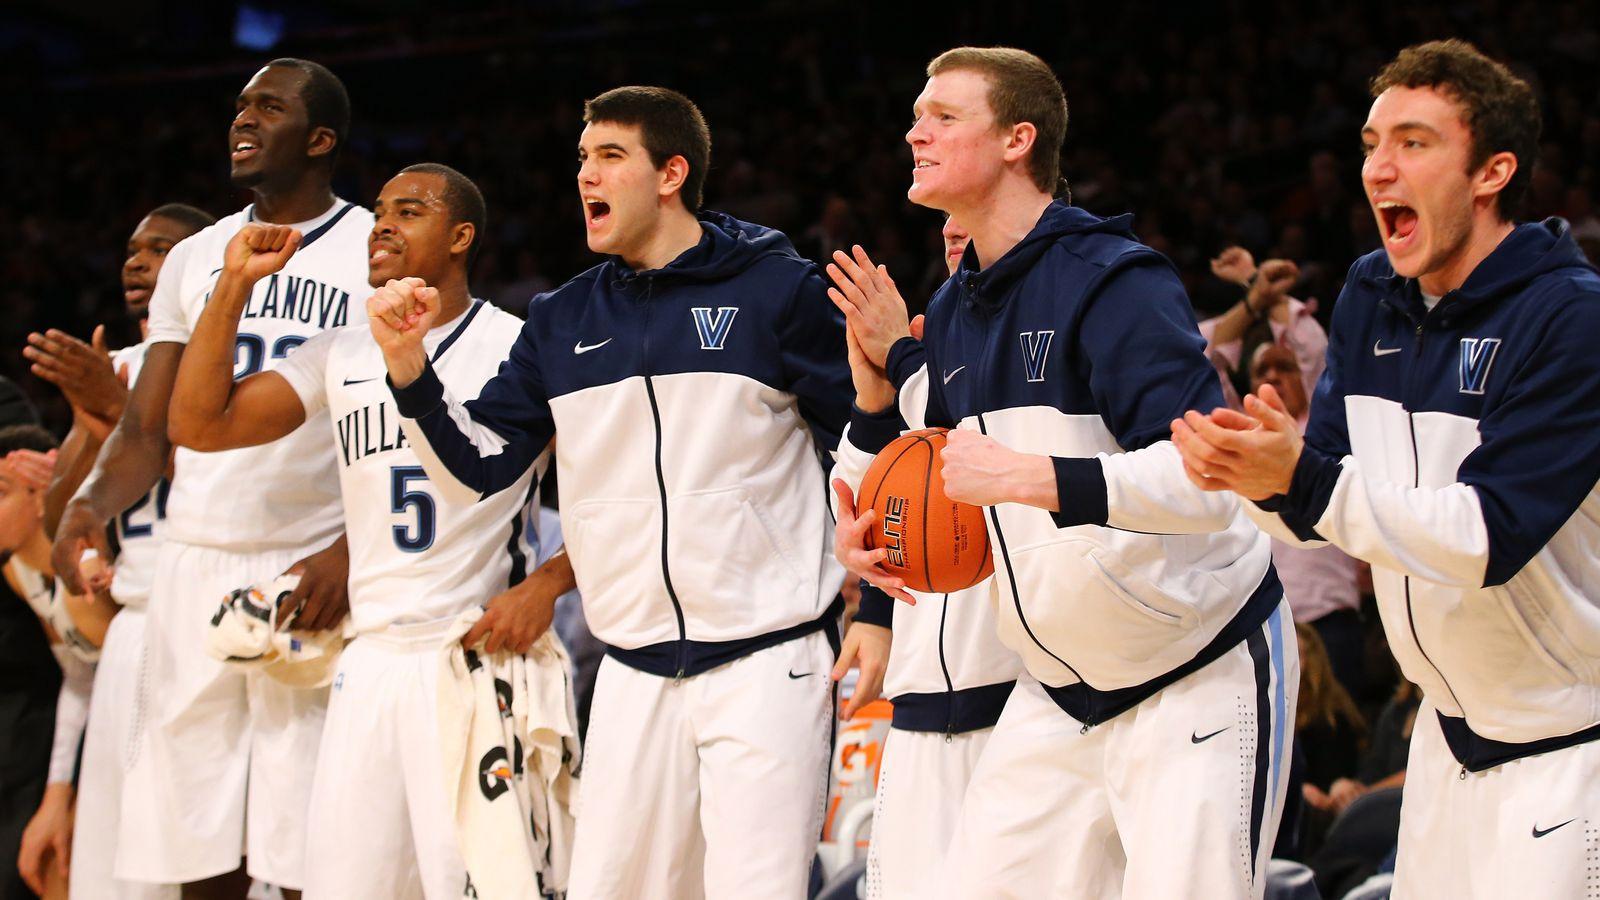 Villanova Basketball 2013-14: What Is A Successful Season